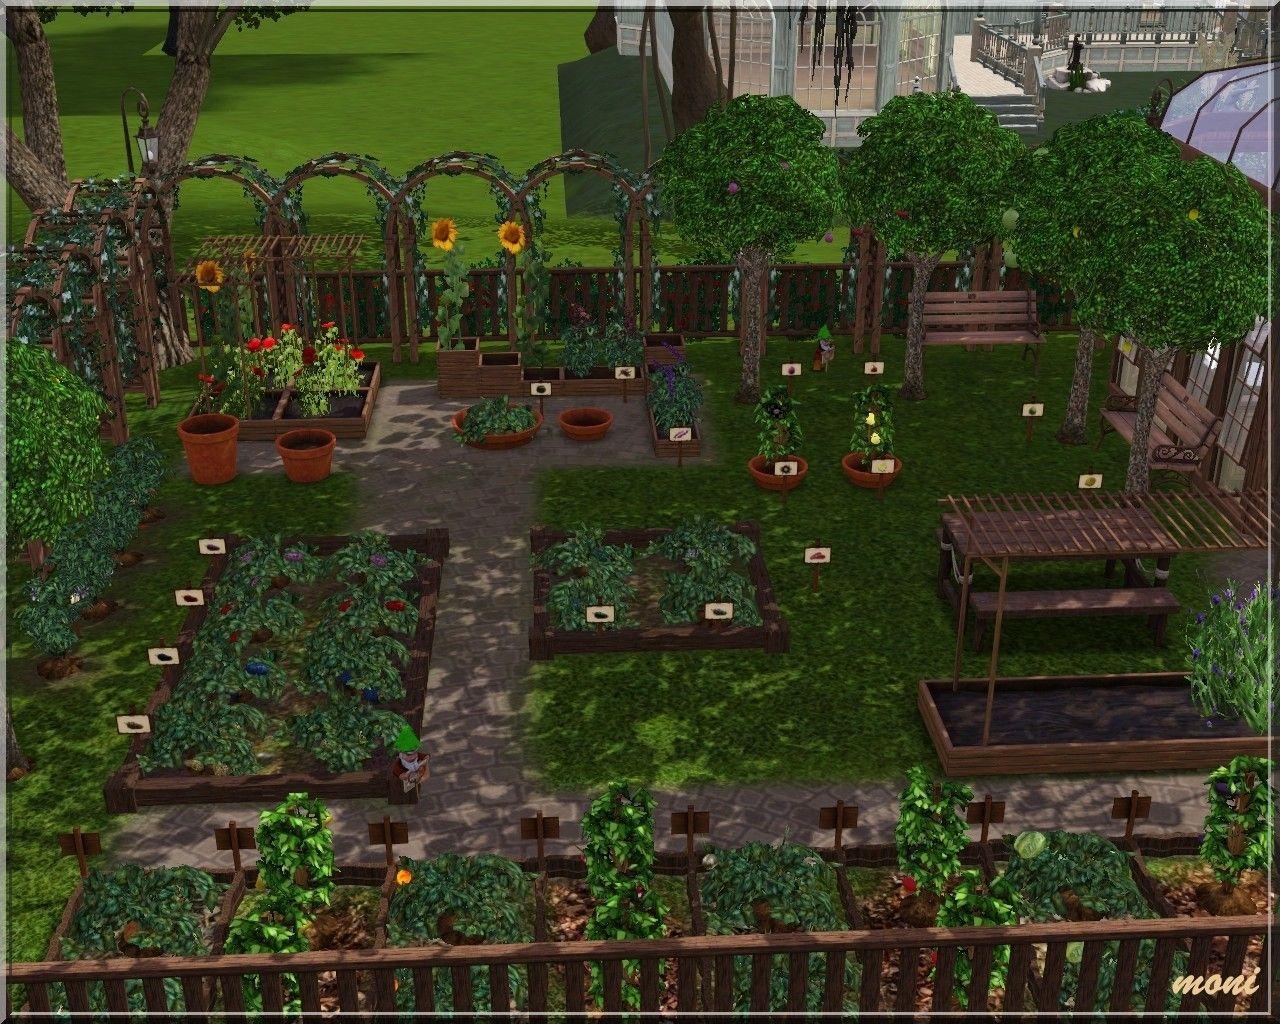 Arda Sims Small Garden The Sims 4 Lots Sims 4 Lots Minecraft Garden Ideas Small